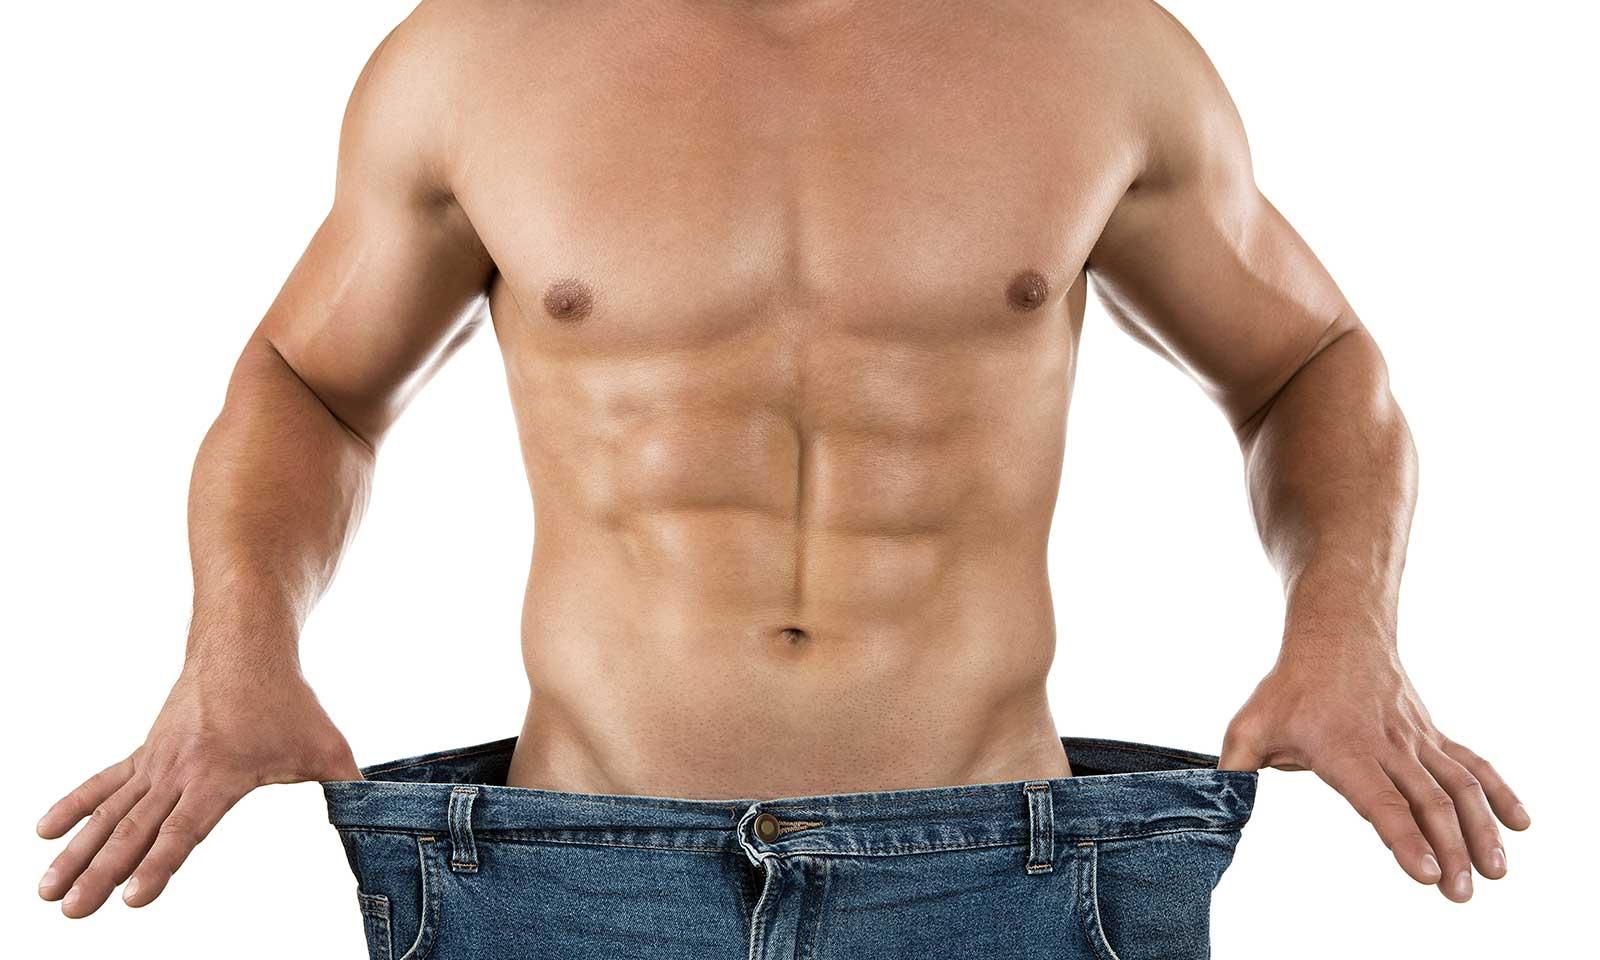 Top 4 Amino Acid Supplements For Fat Loss